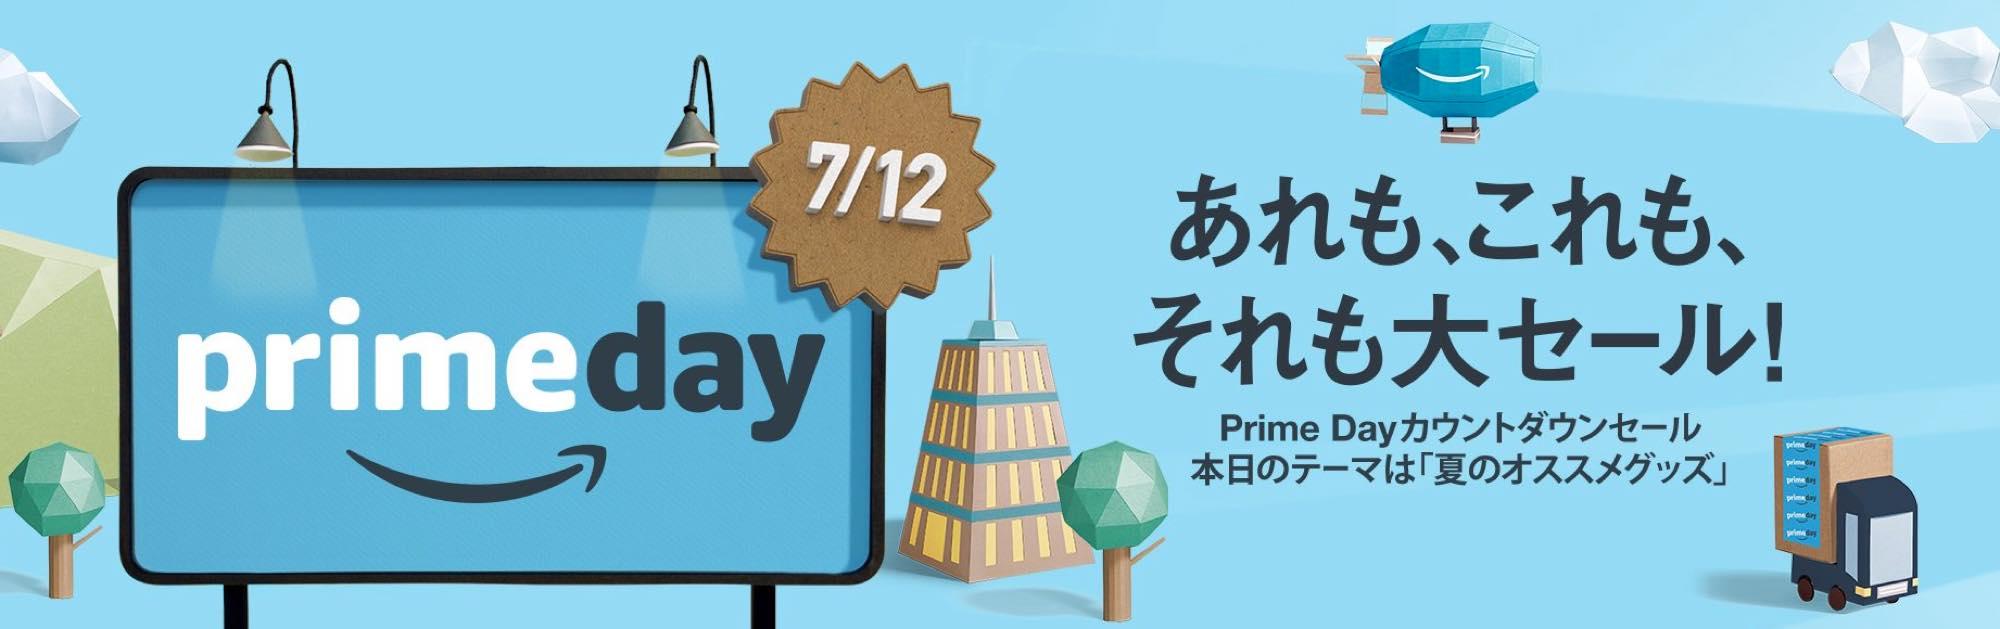 primeday-2016summer3